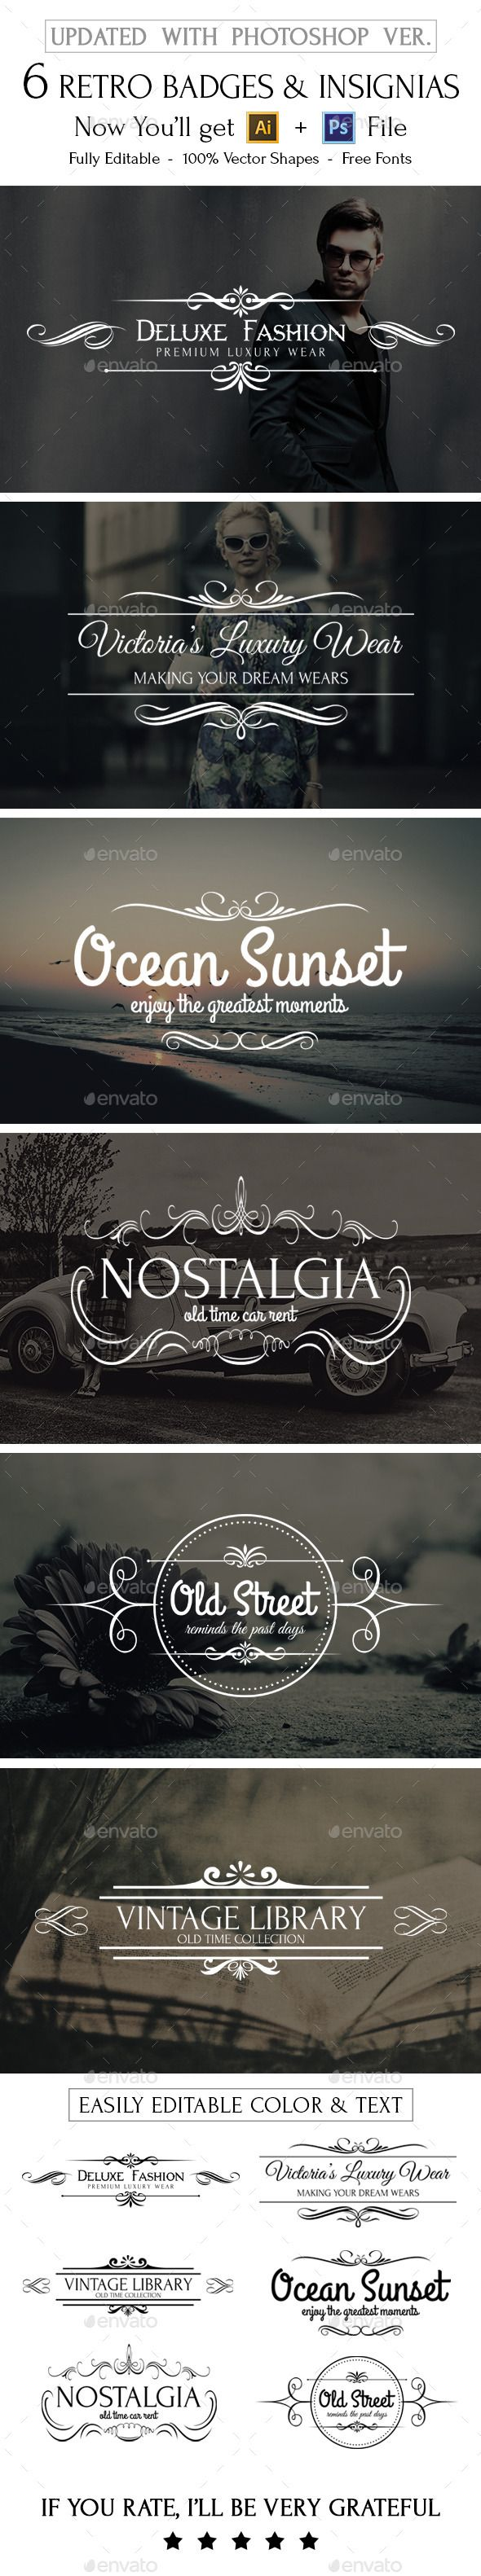 best ideas about retro logos hipster logo 6 retro logos and insignias